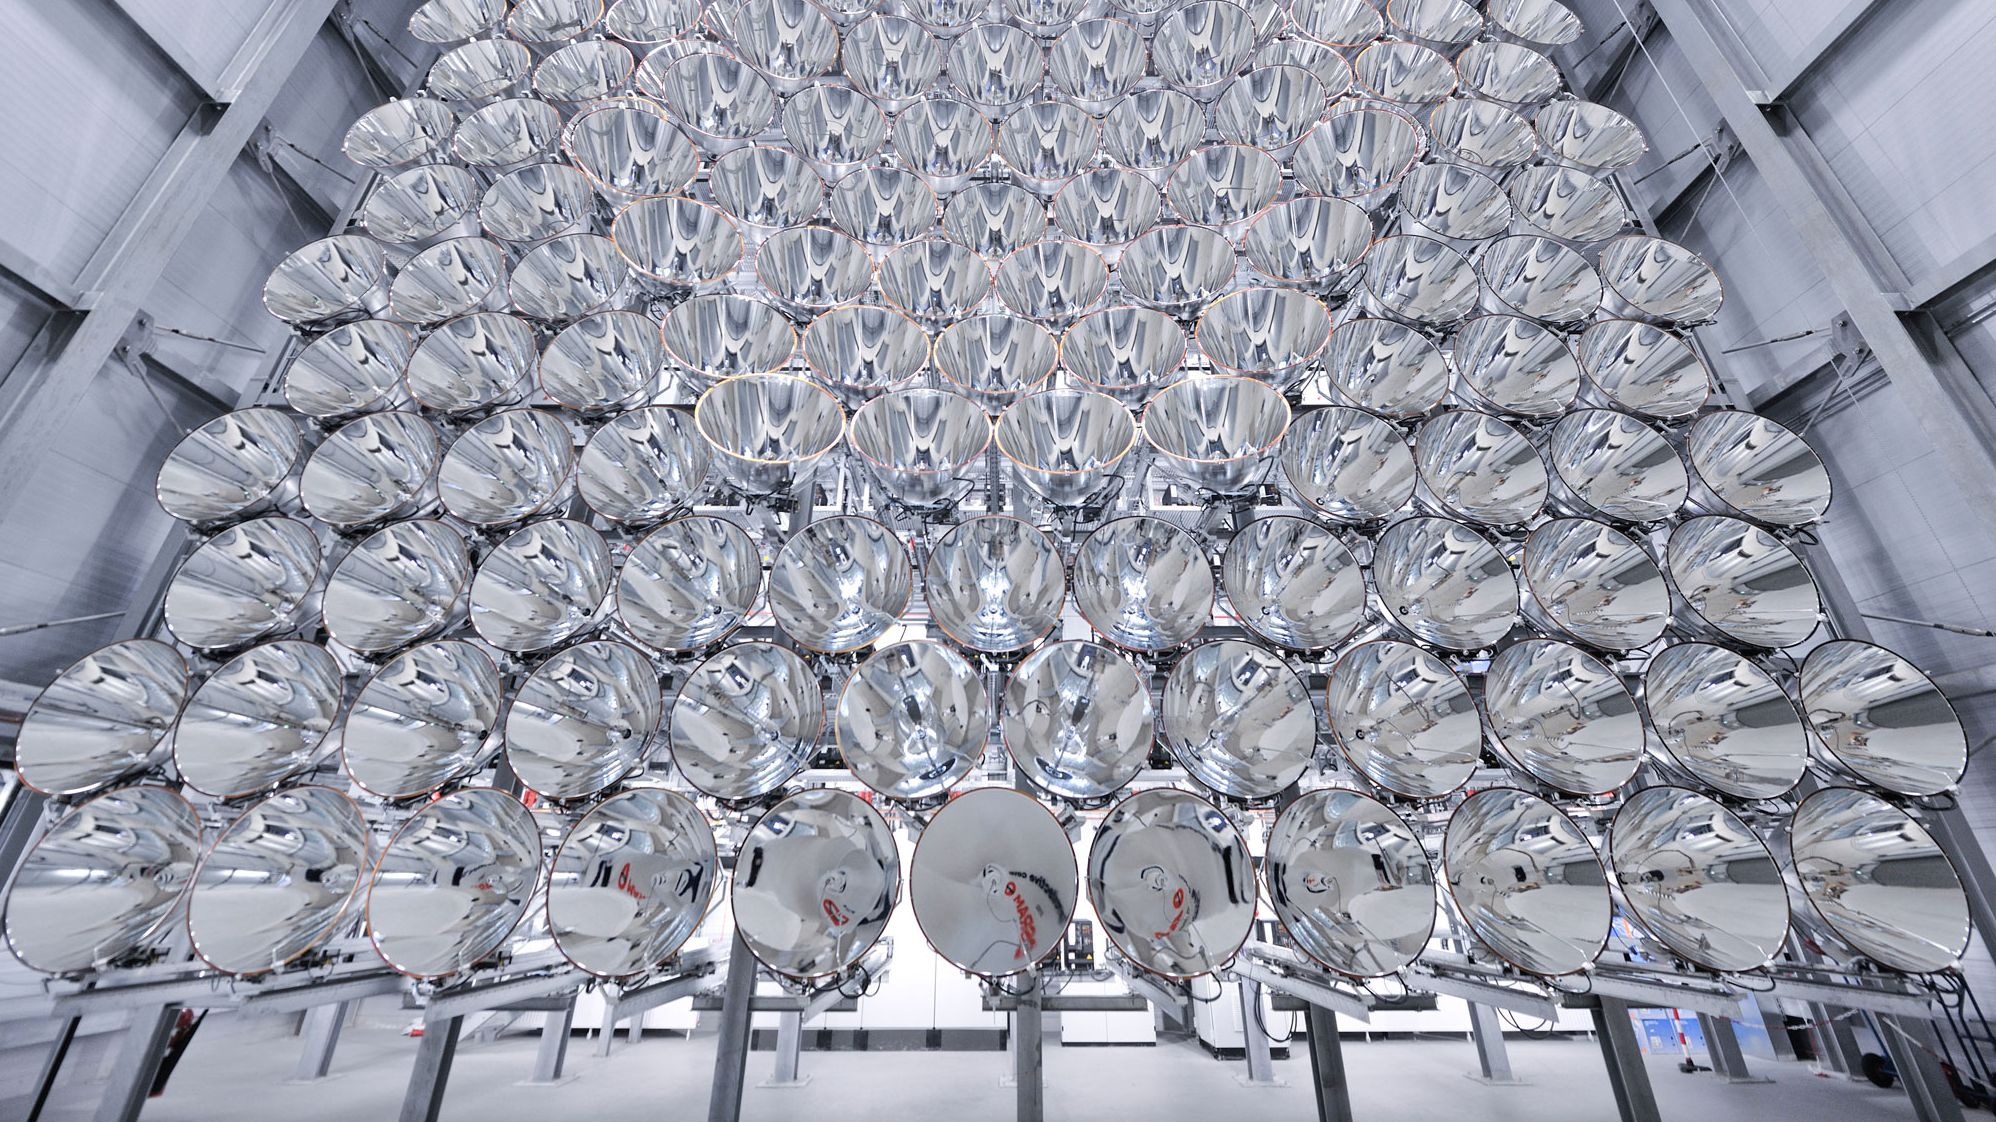 世界最大の人工太陽、水素発電に挑戦中